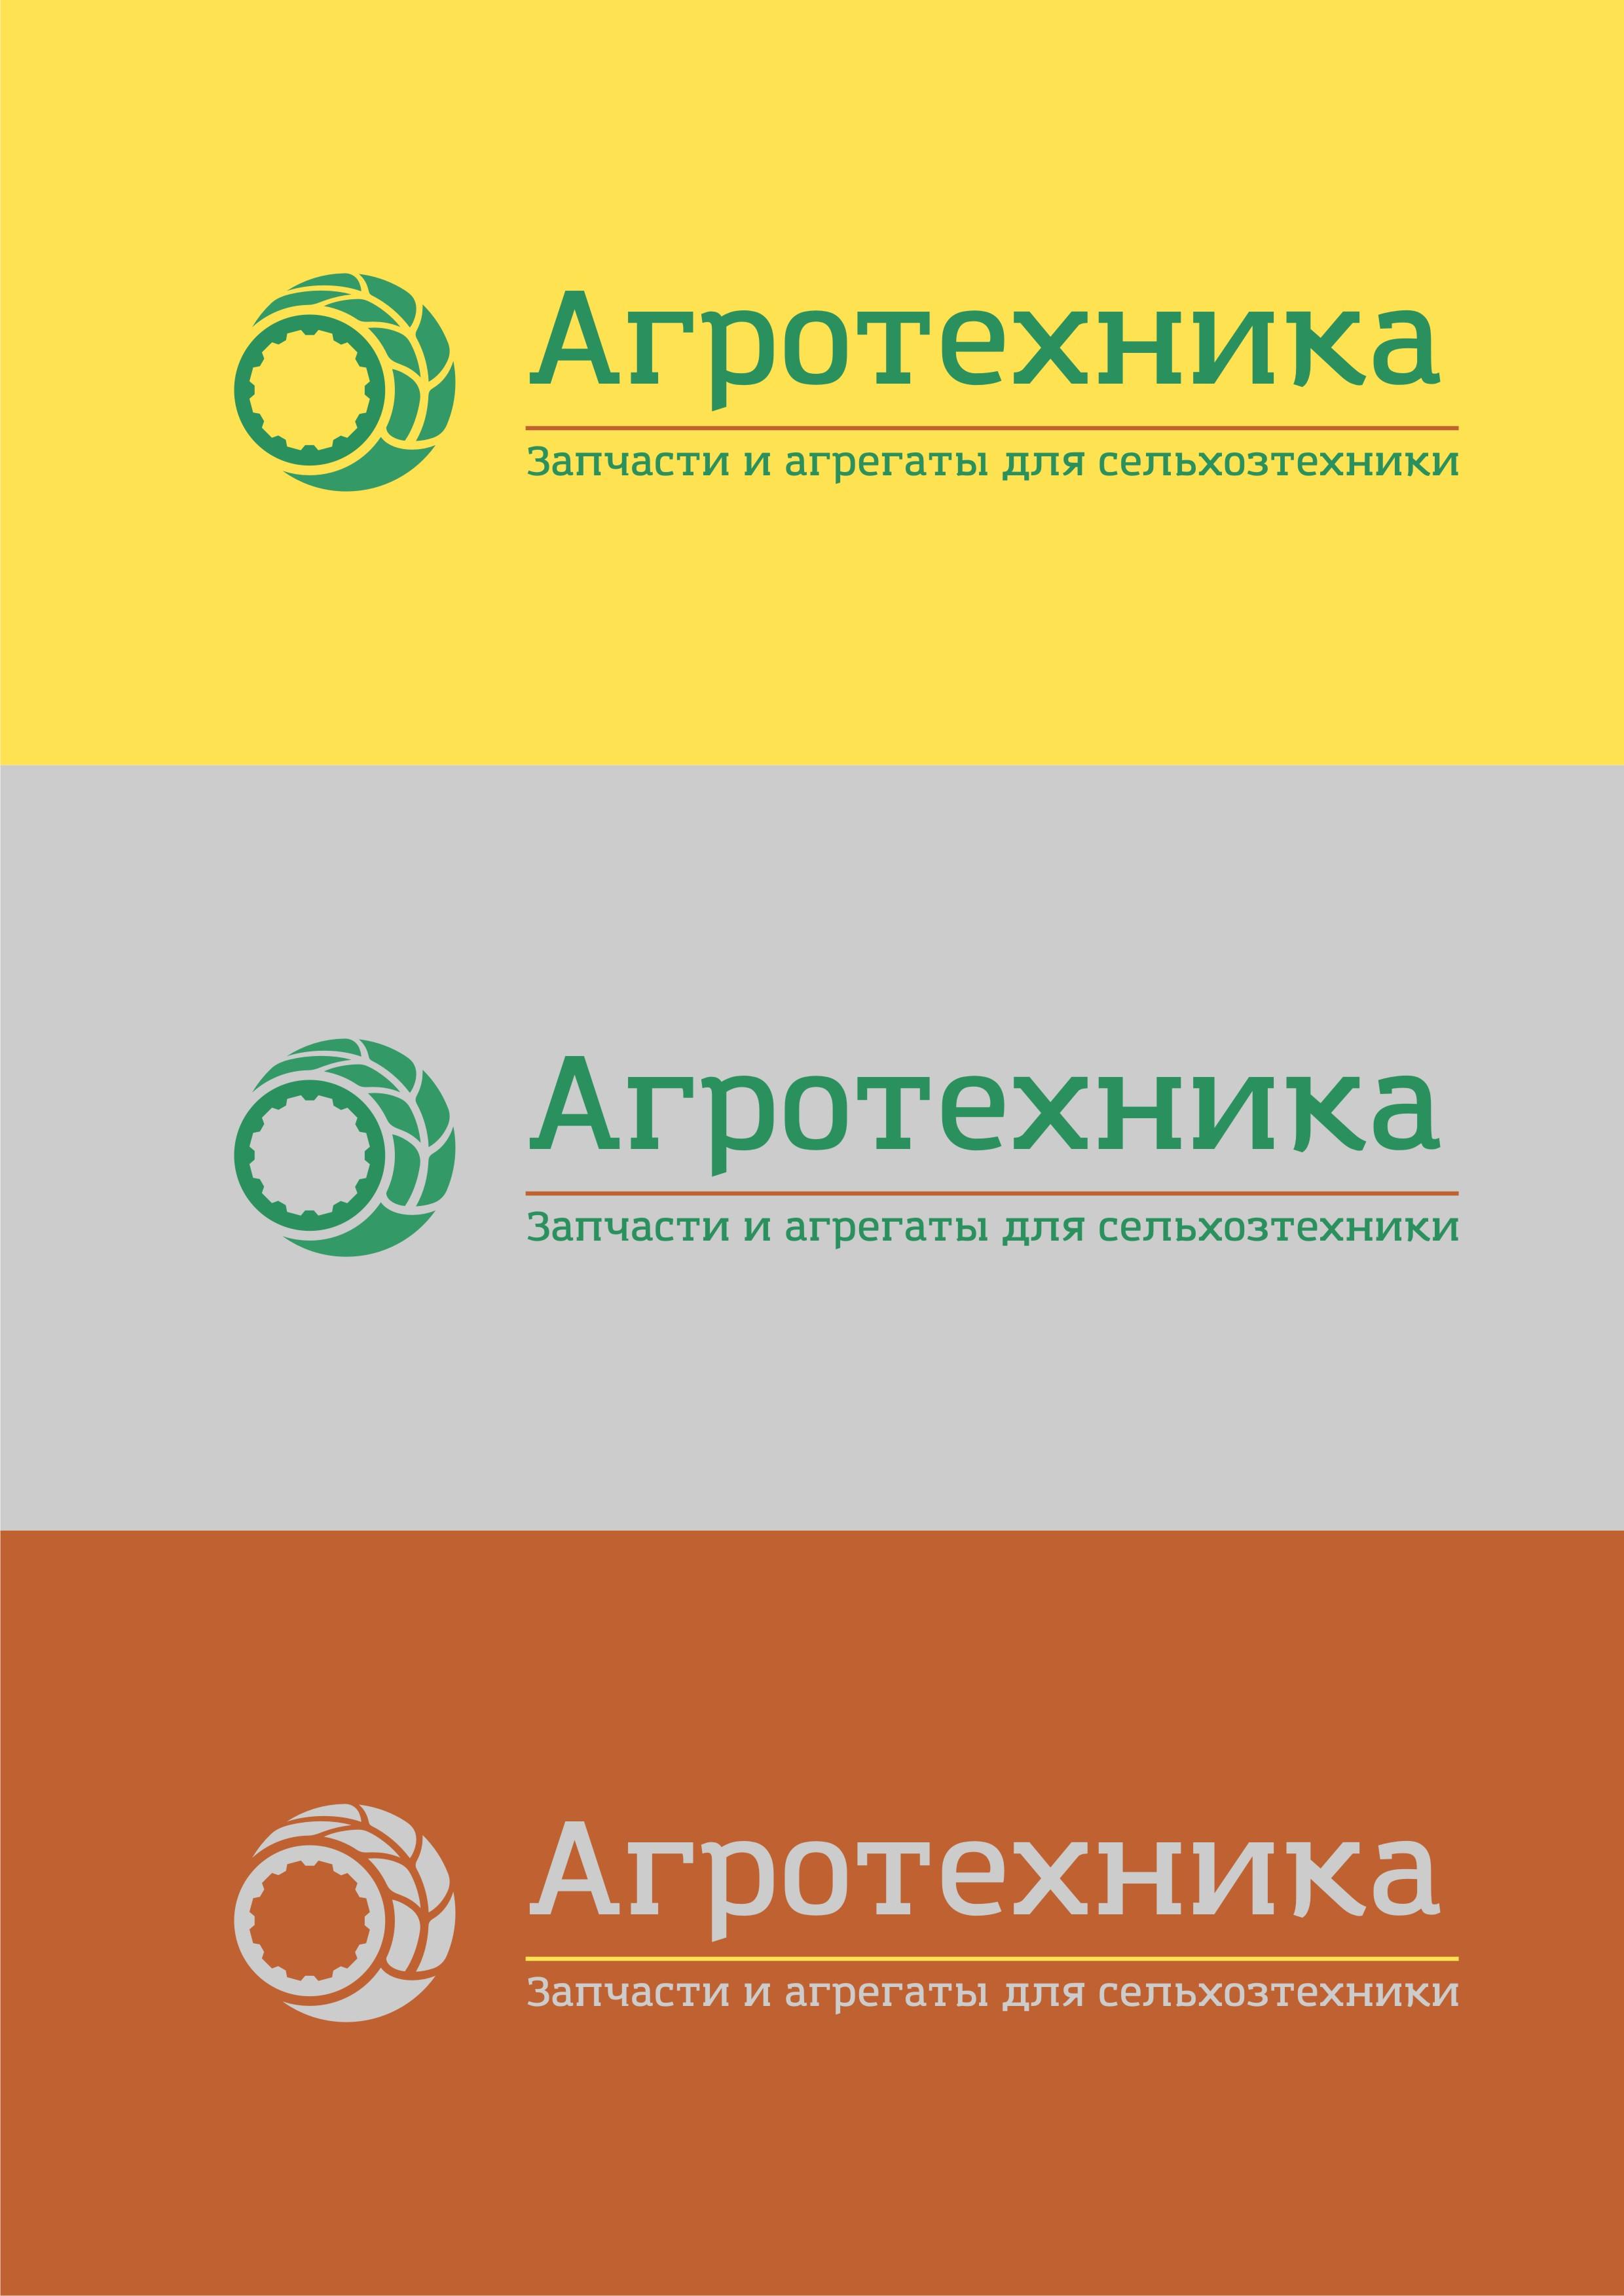 Разработка логотипа для компании Агротехника фото f_9095c09b4c463602.jpg